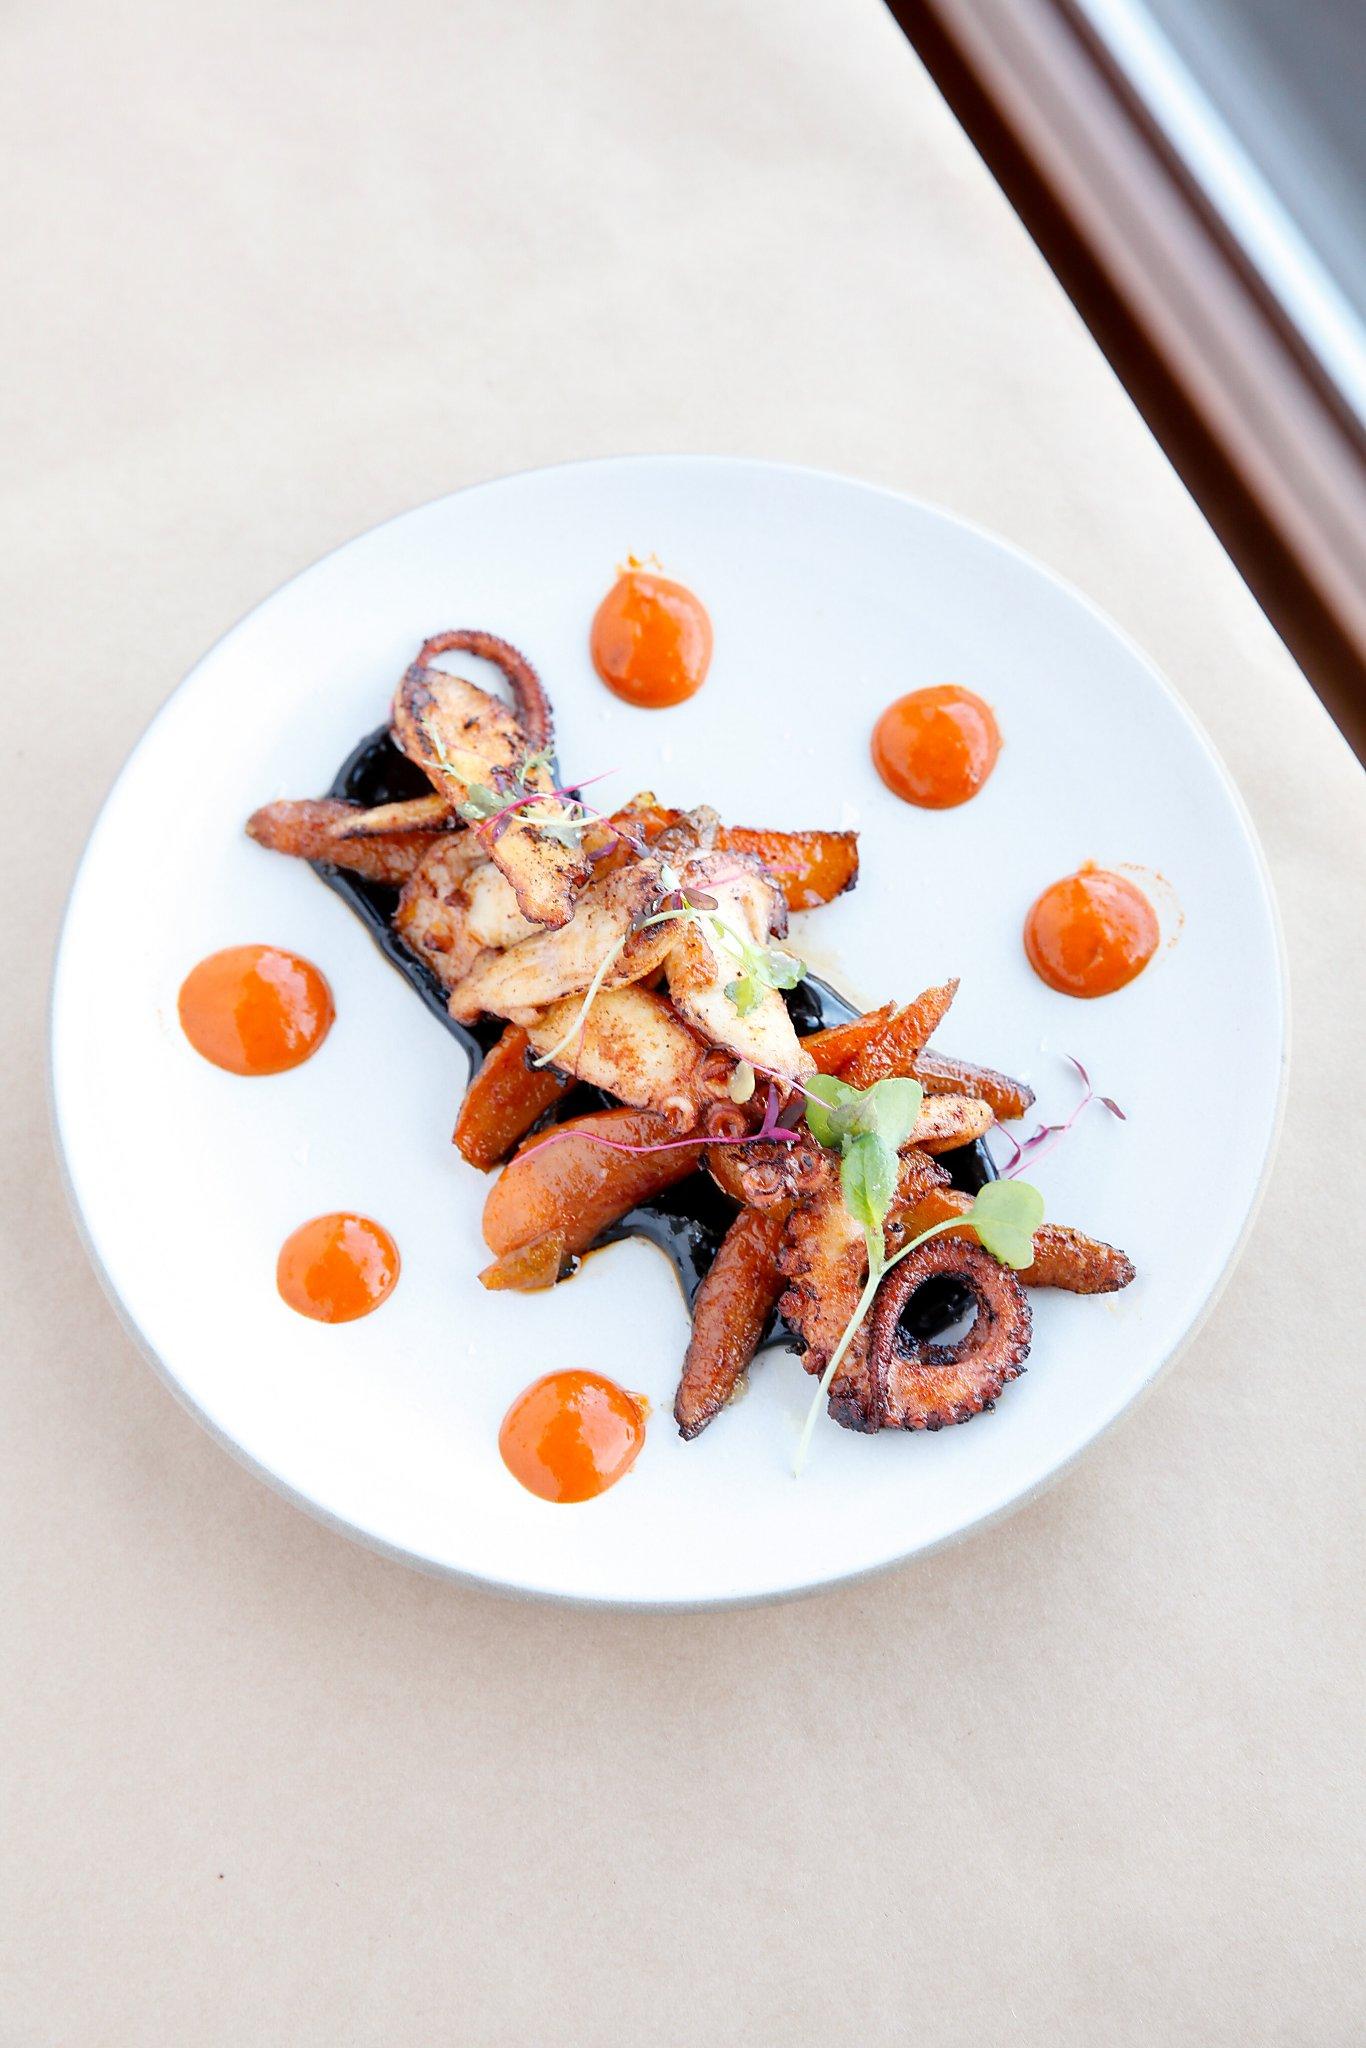 Downtown Napa's sizzling restaurant scene - SFGate